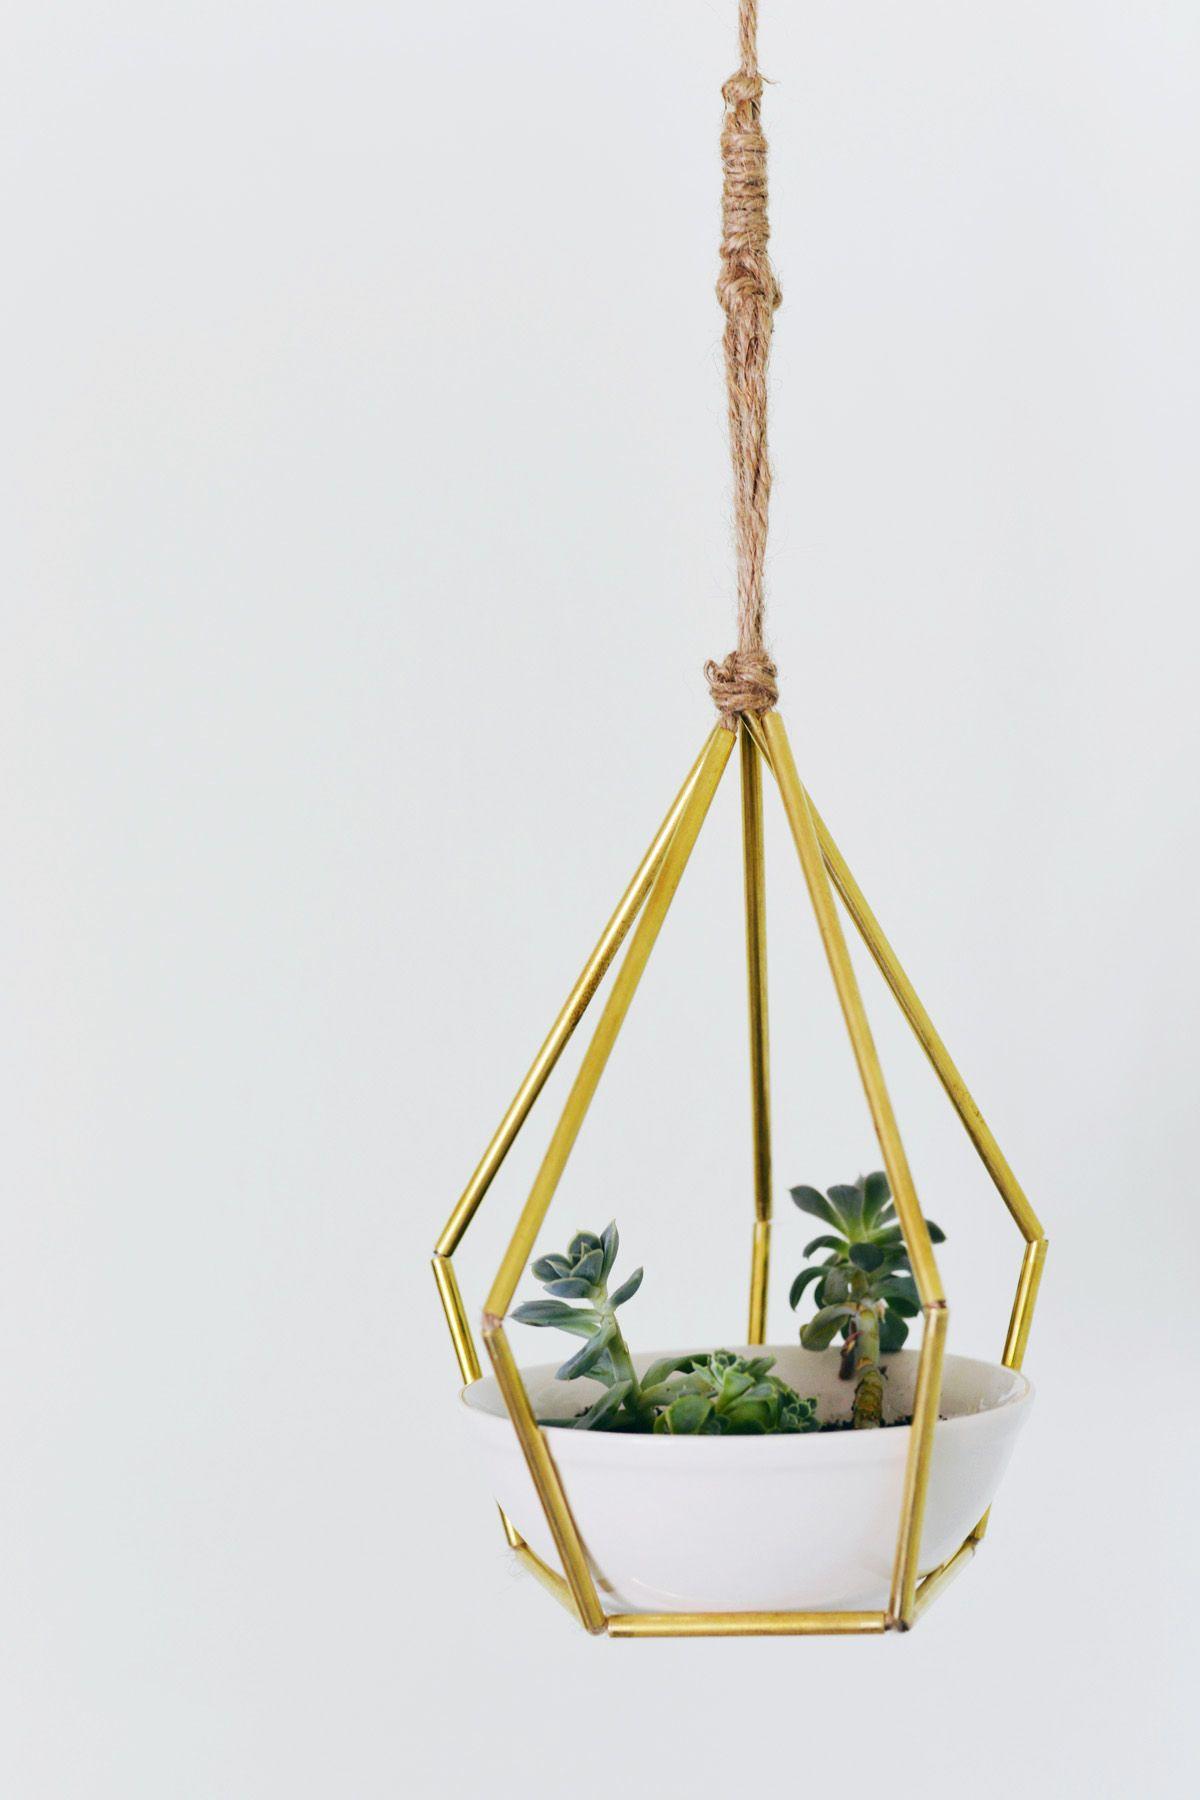 Hanging Planters Diy Geometric Metal Tubing Hanging Planter Planters Craft And